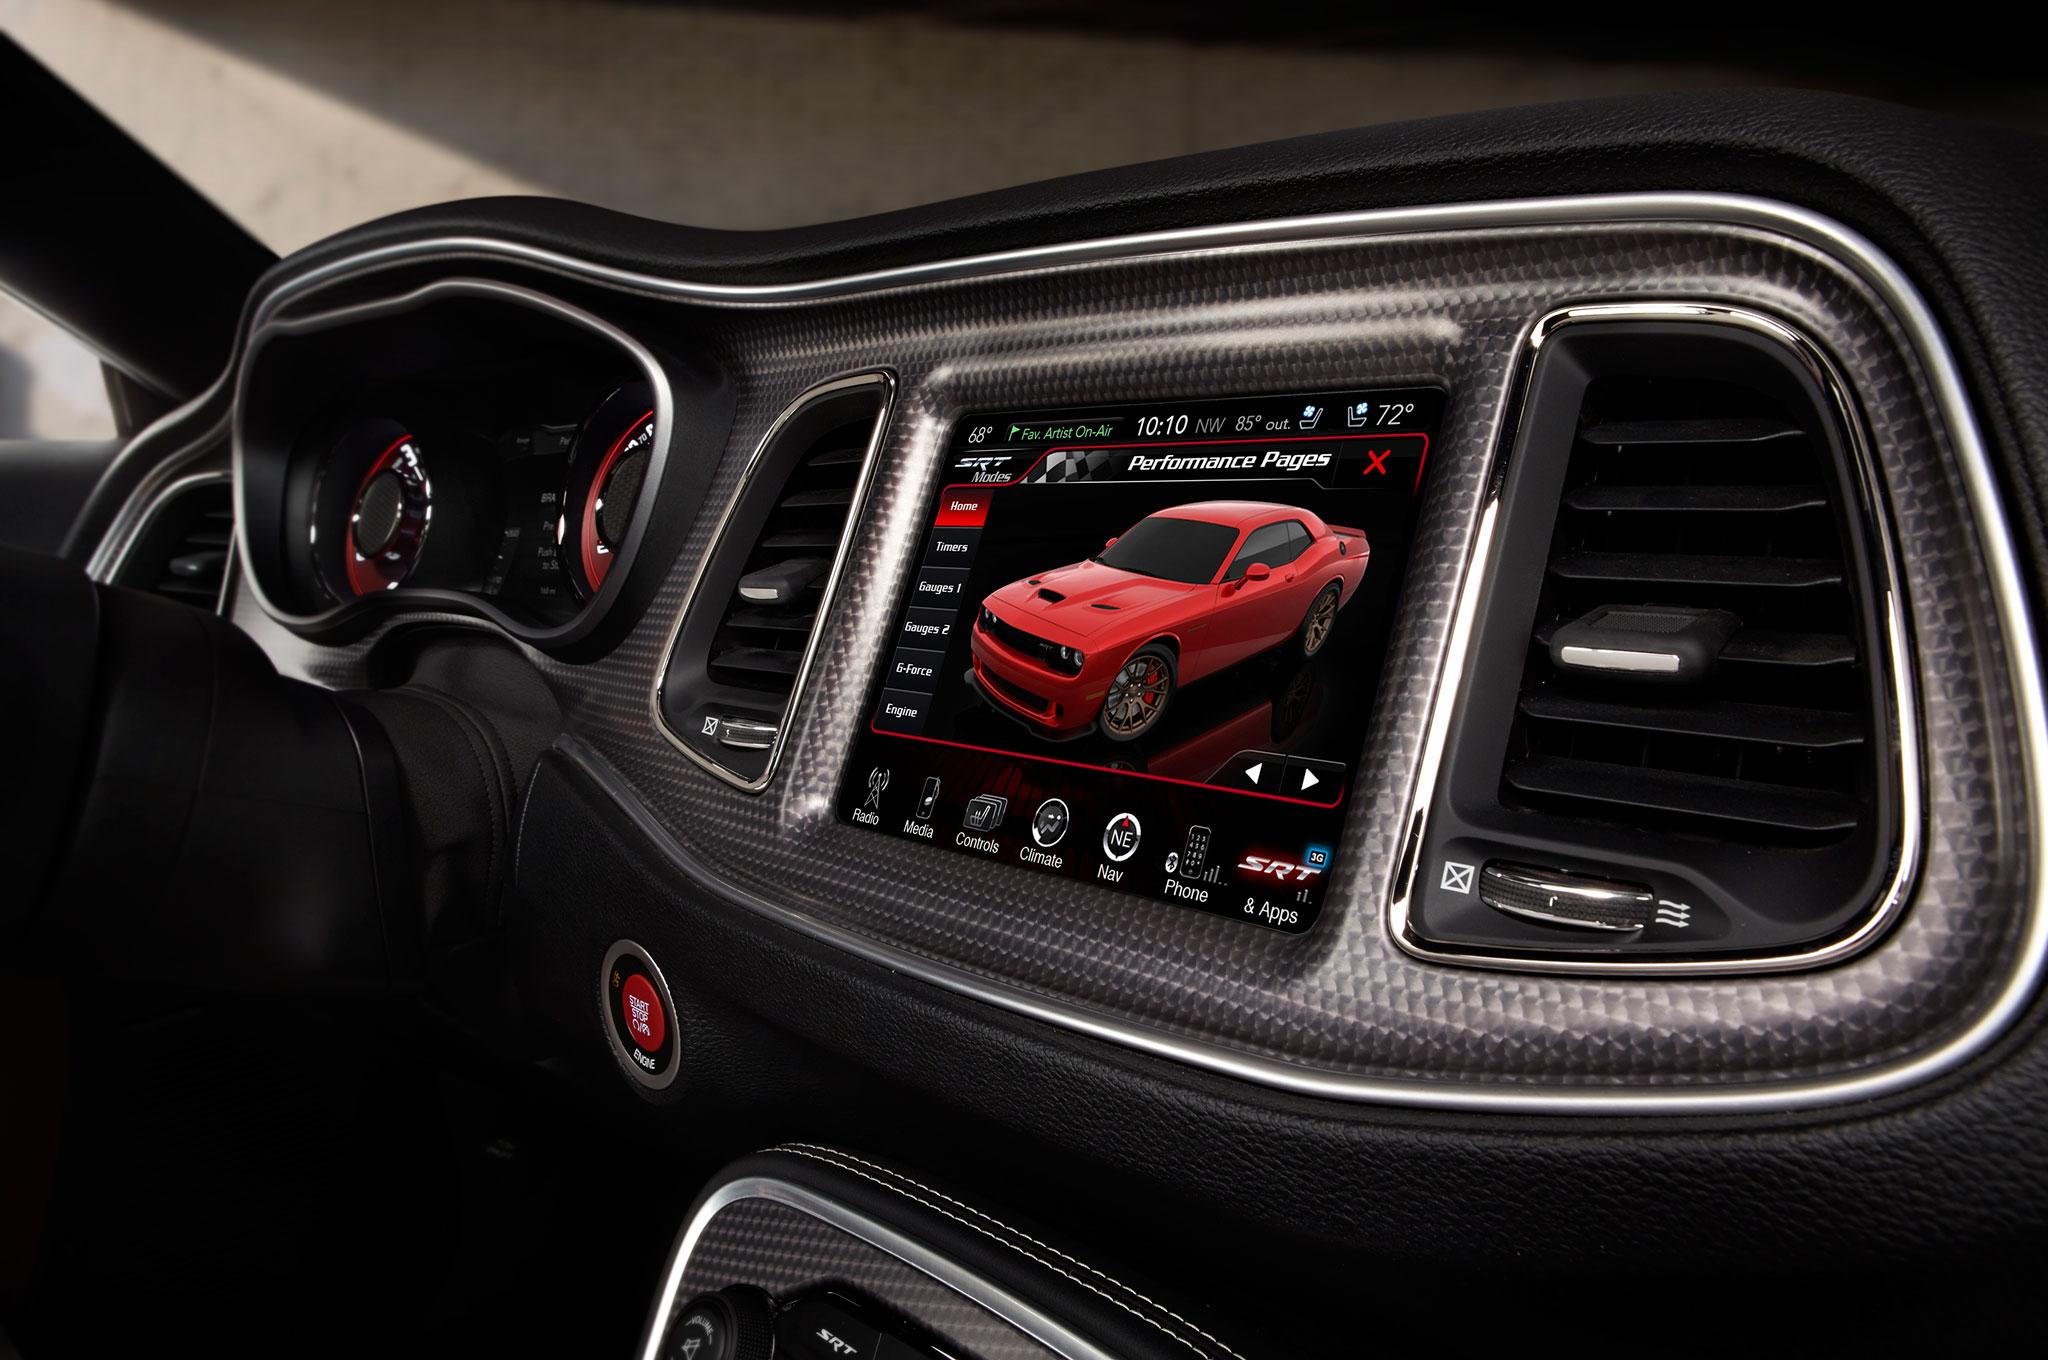 2015-dodge-challenger-srt-hellcat-interior.jpg